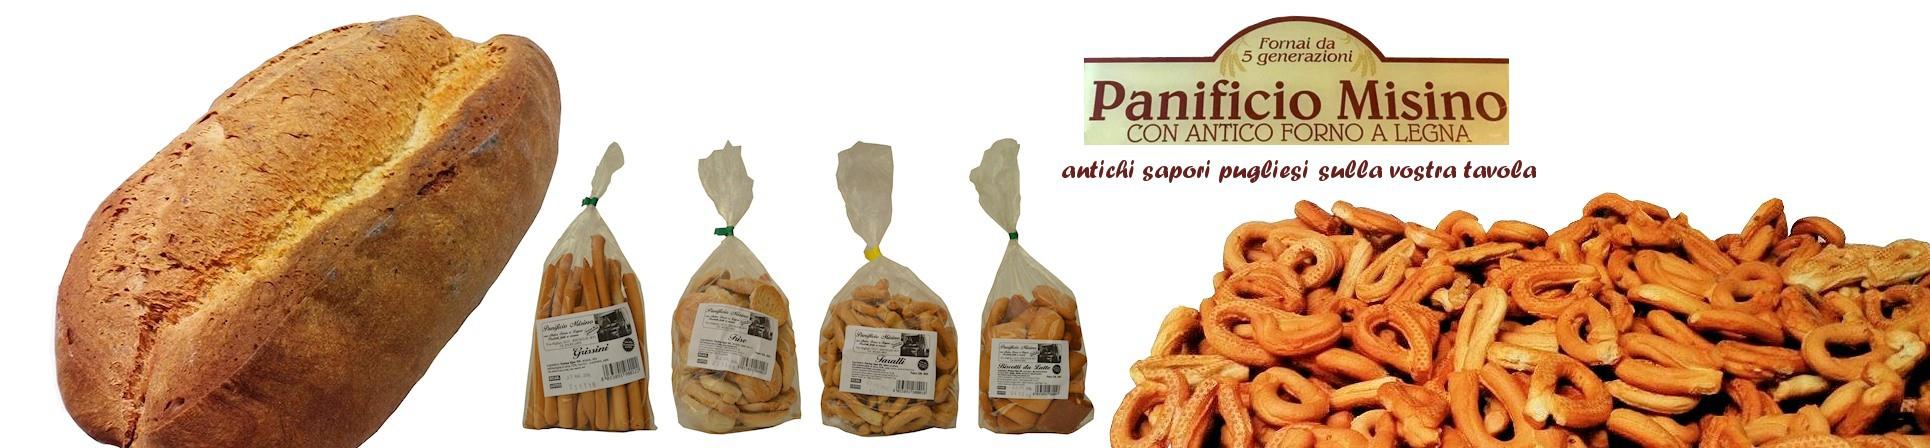 vendita online grissini pugliesi - PANIFICIO MISINO acquista online